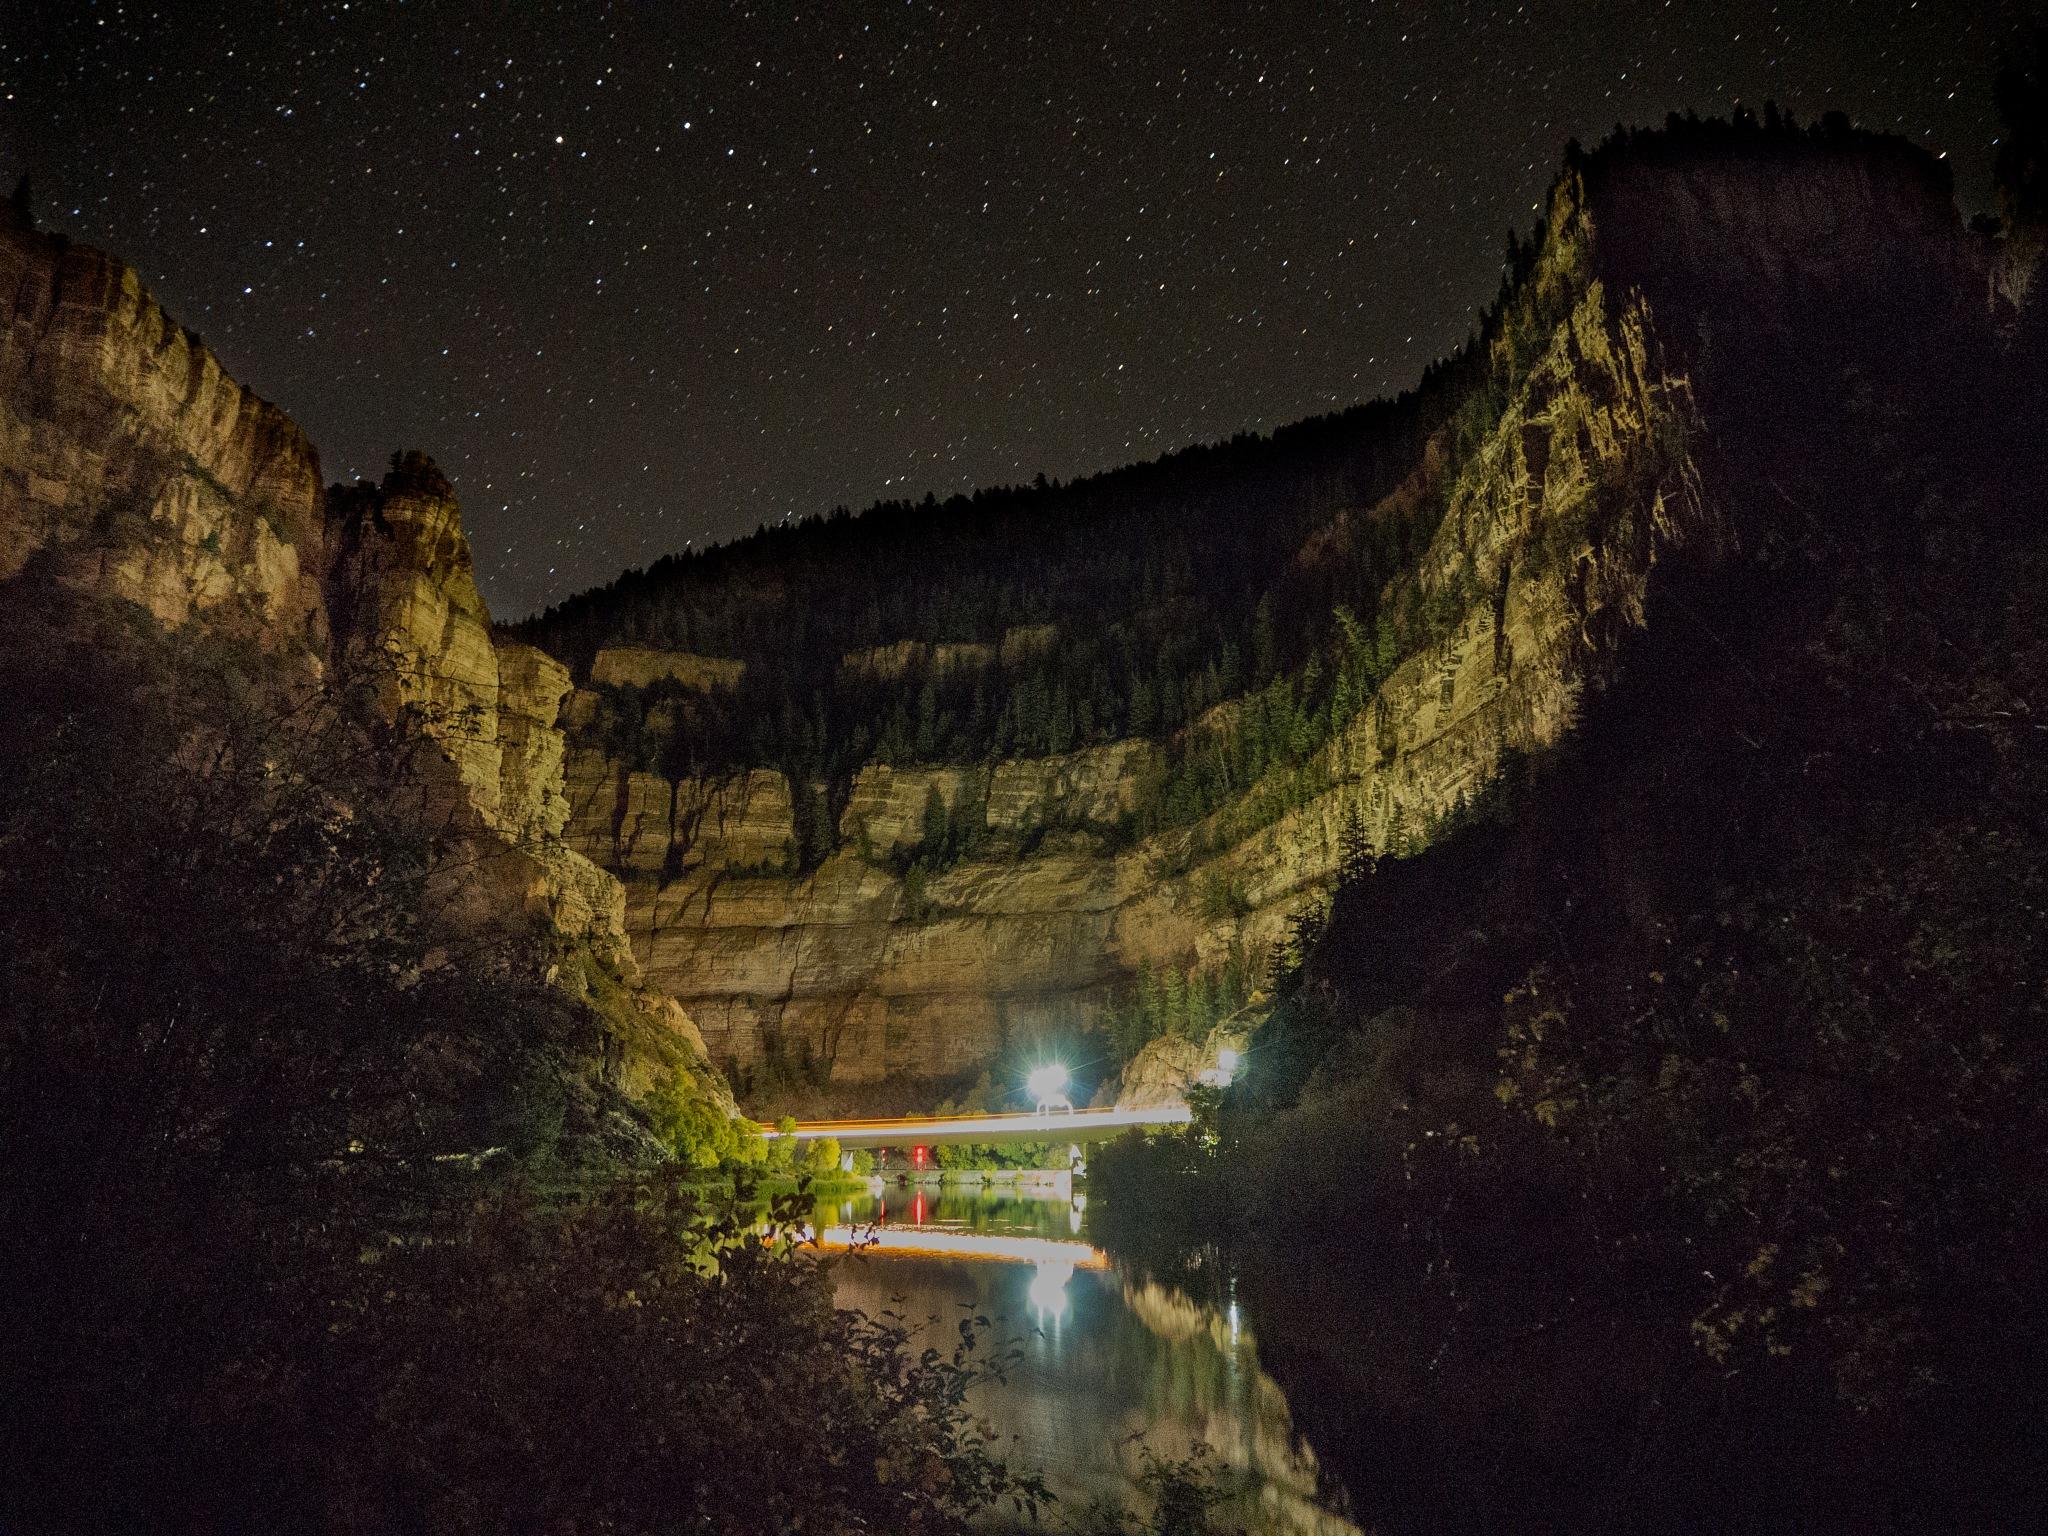 Canyon Lights by mrife